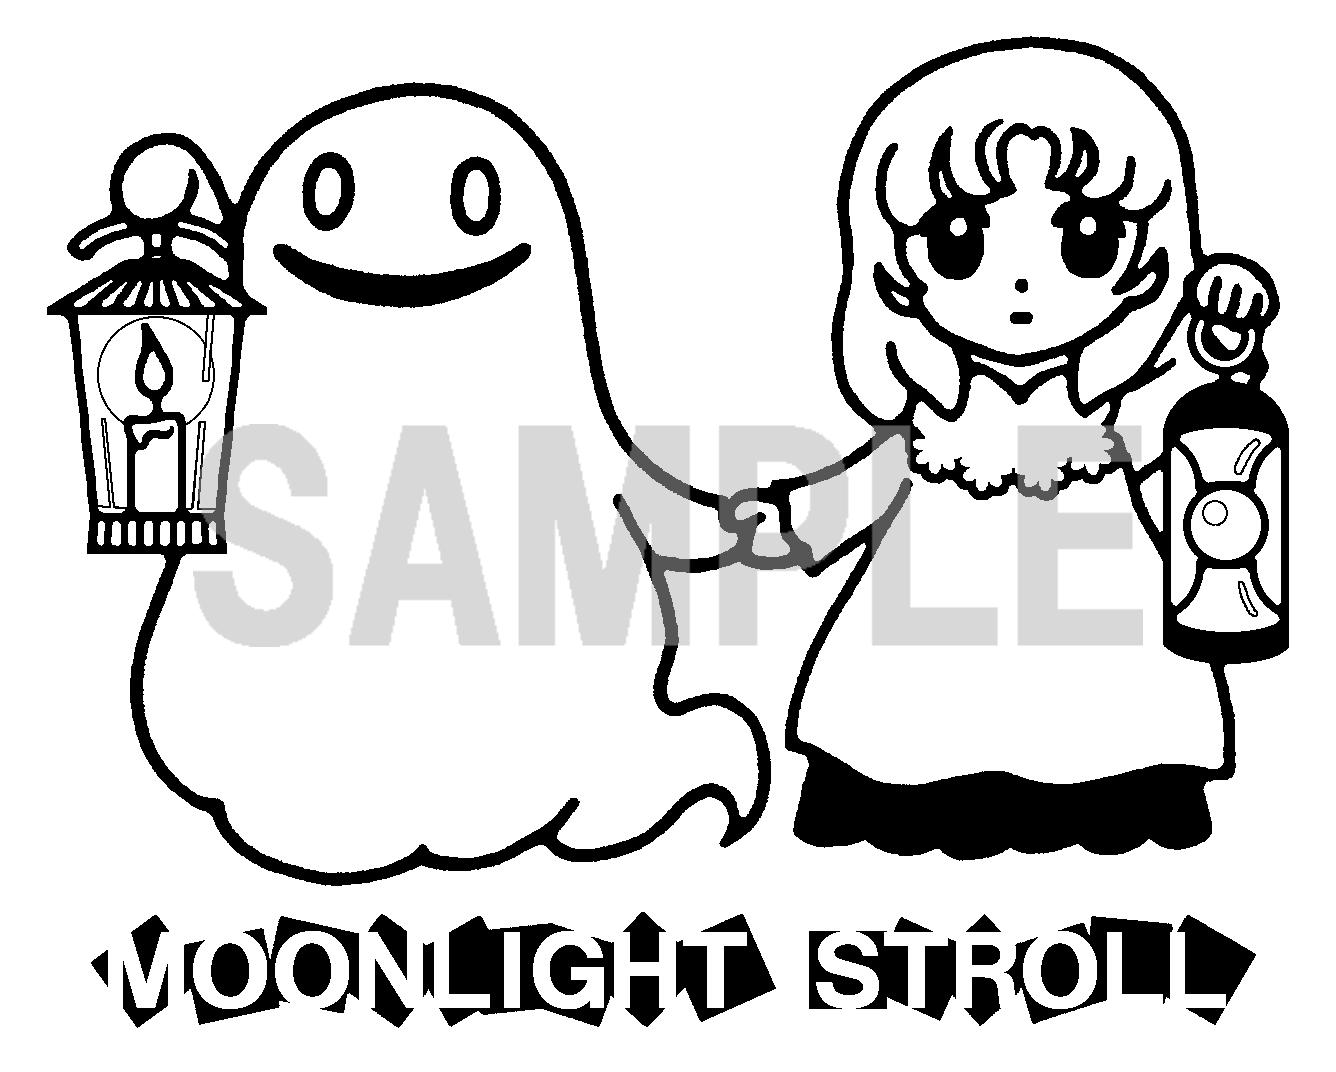 MOOMLIGHT STROLL夜中の散歩サンプル